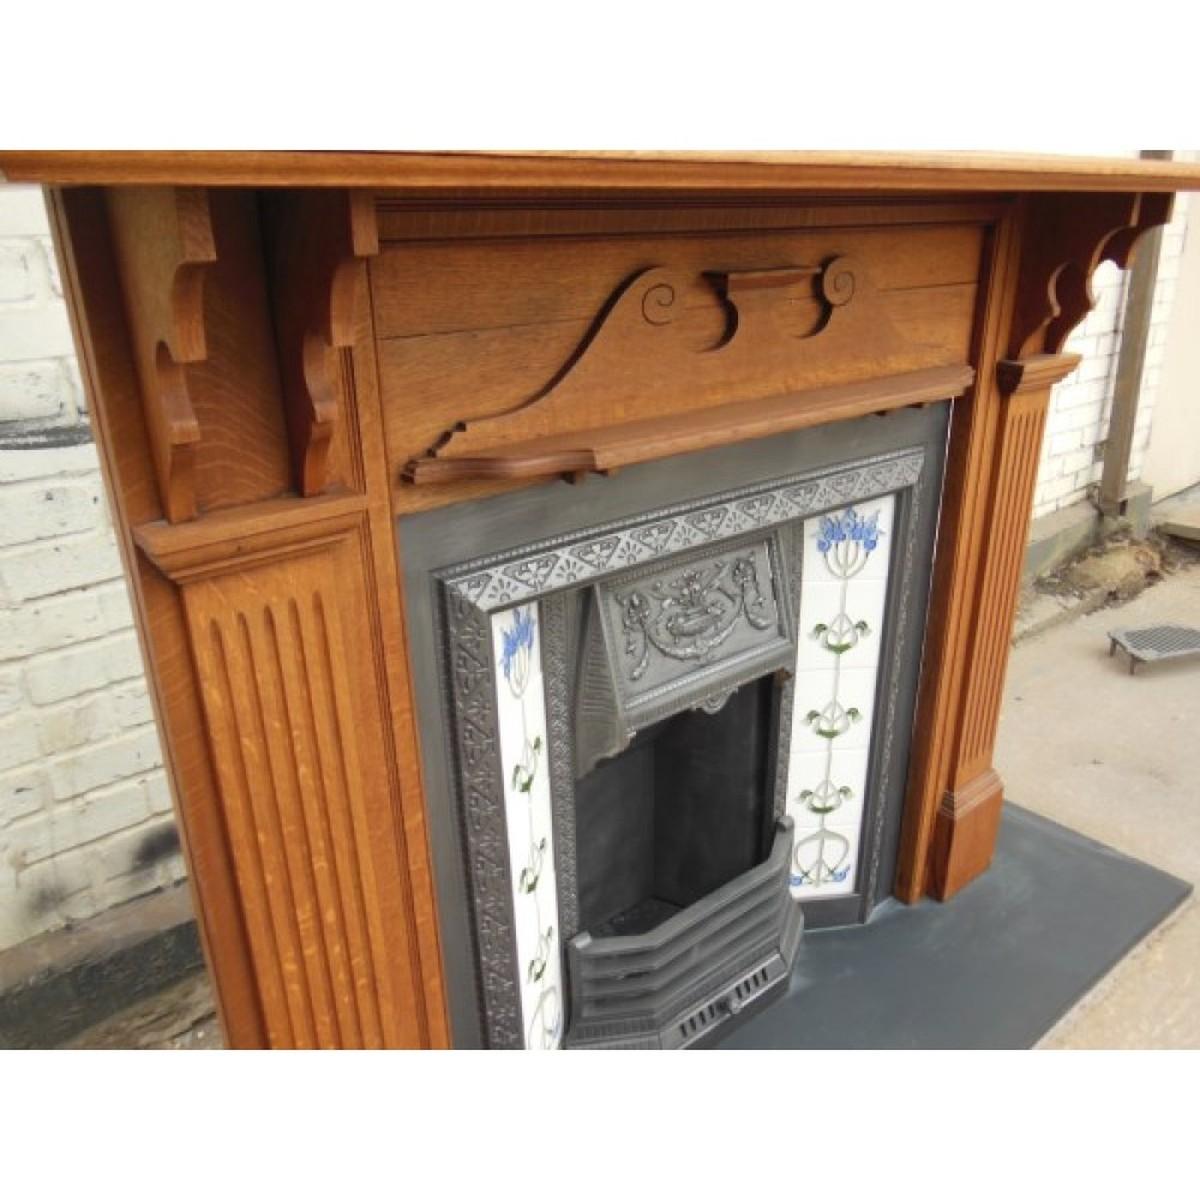 Antiques Bazaar Victorian 1837 To 1901 Original Oak Victorian Fireplace Surround With